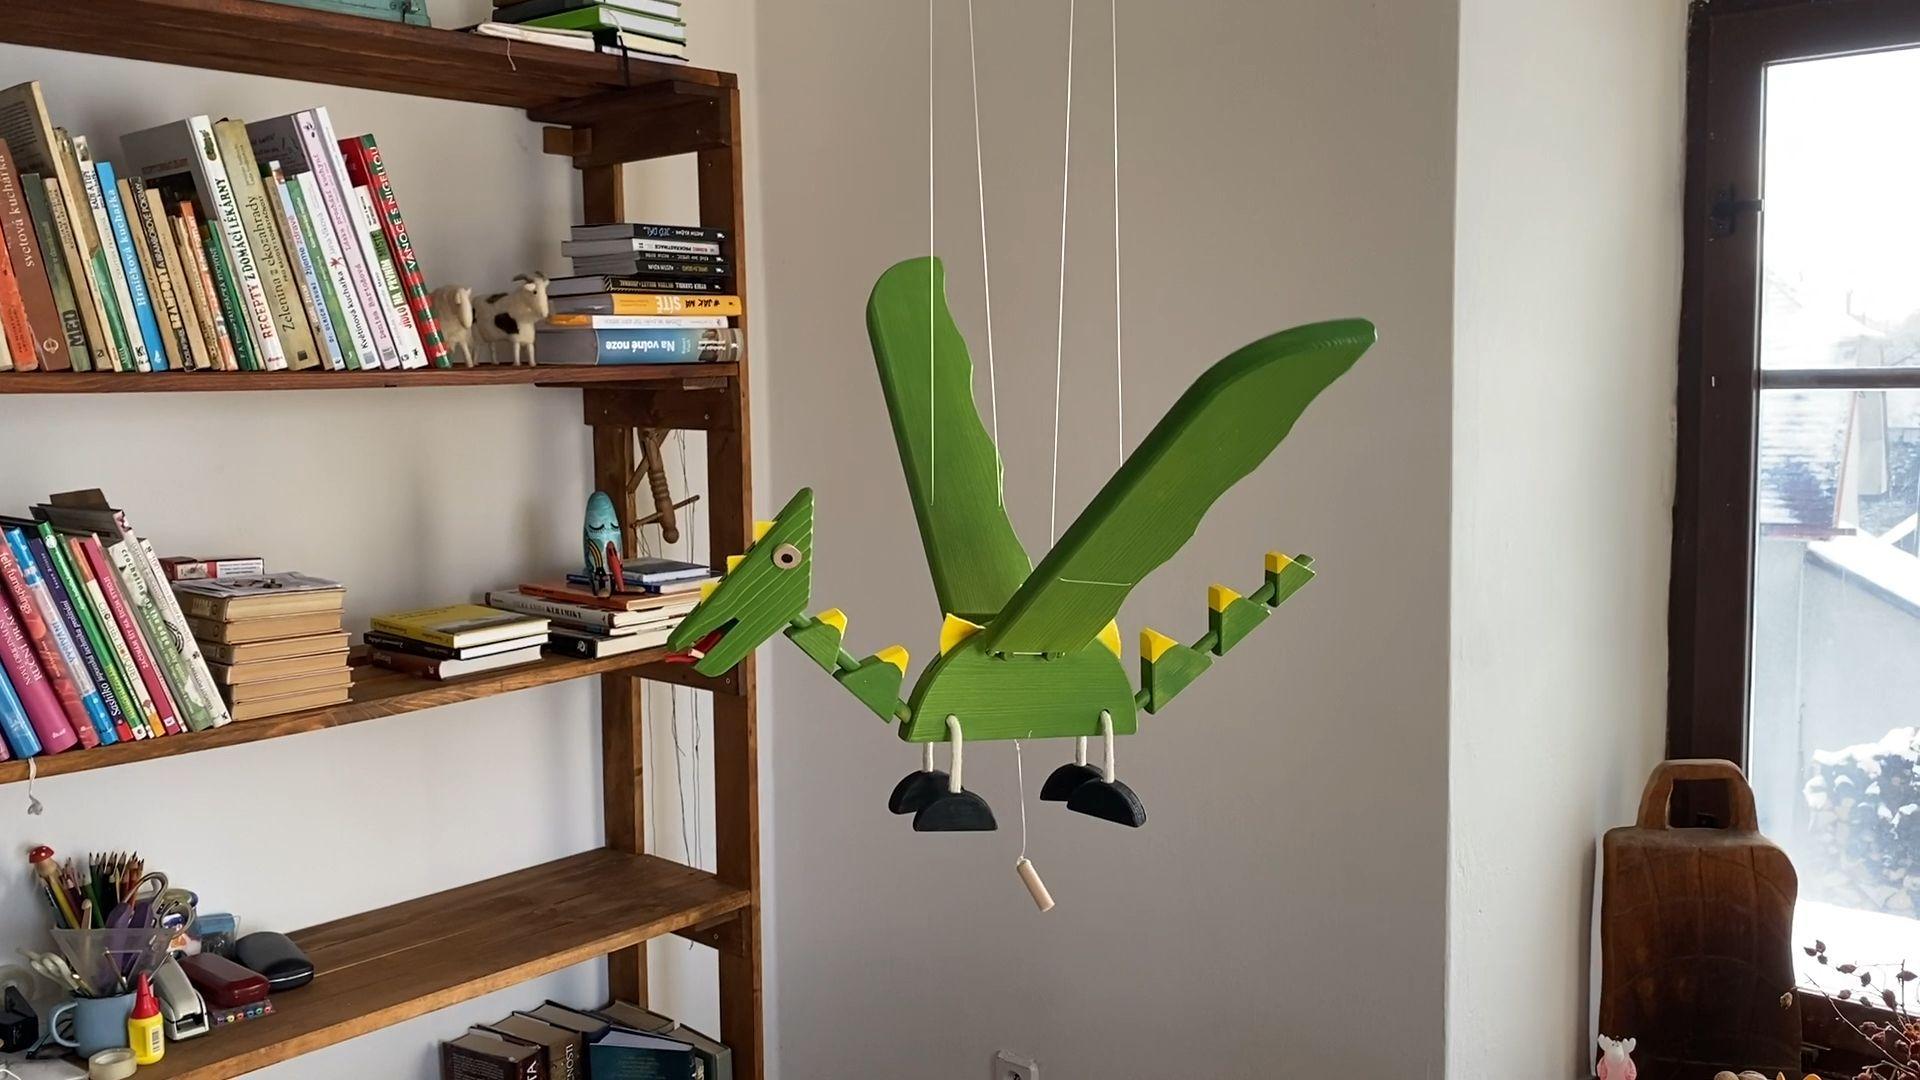 Flying Dragon Wooden Mobile Toy Dragon Flying Mobile Toy Wooden In 2020 Wooden Animal Toys Wooden Toys Diy Kids Room Decor